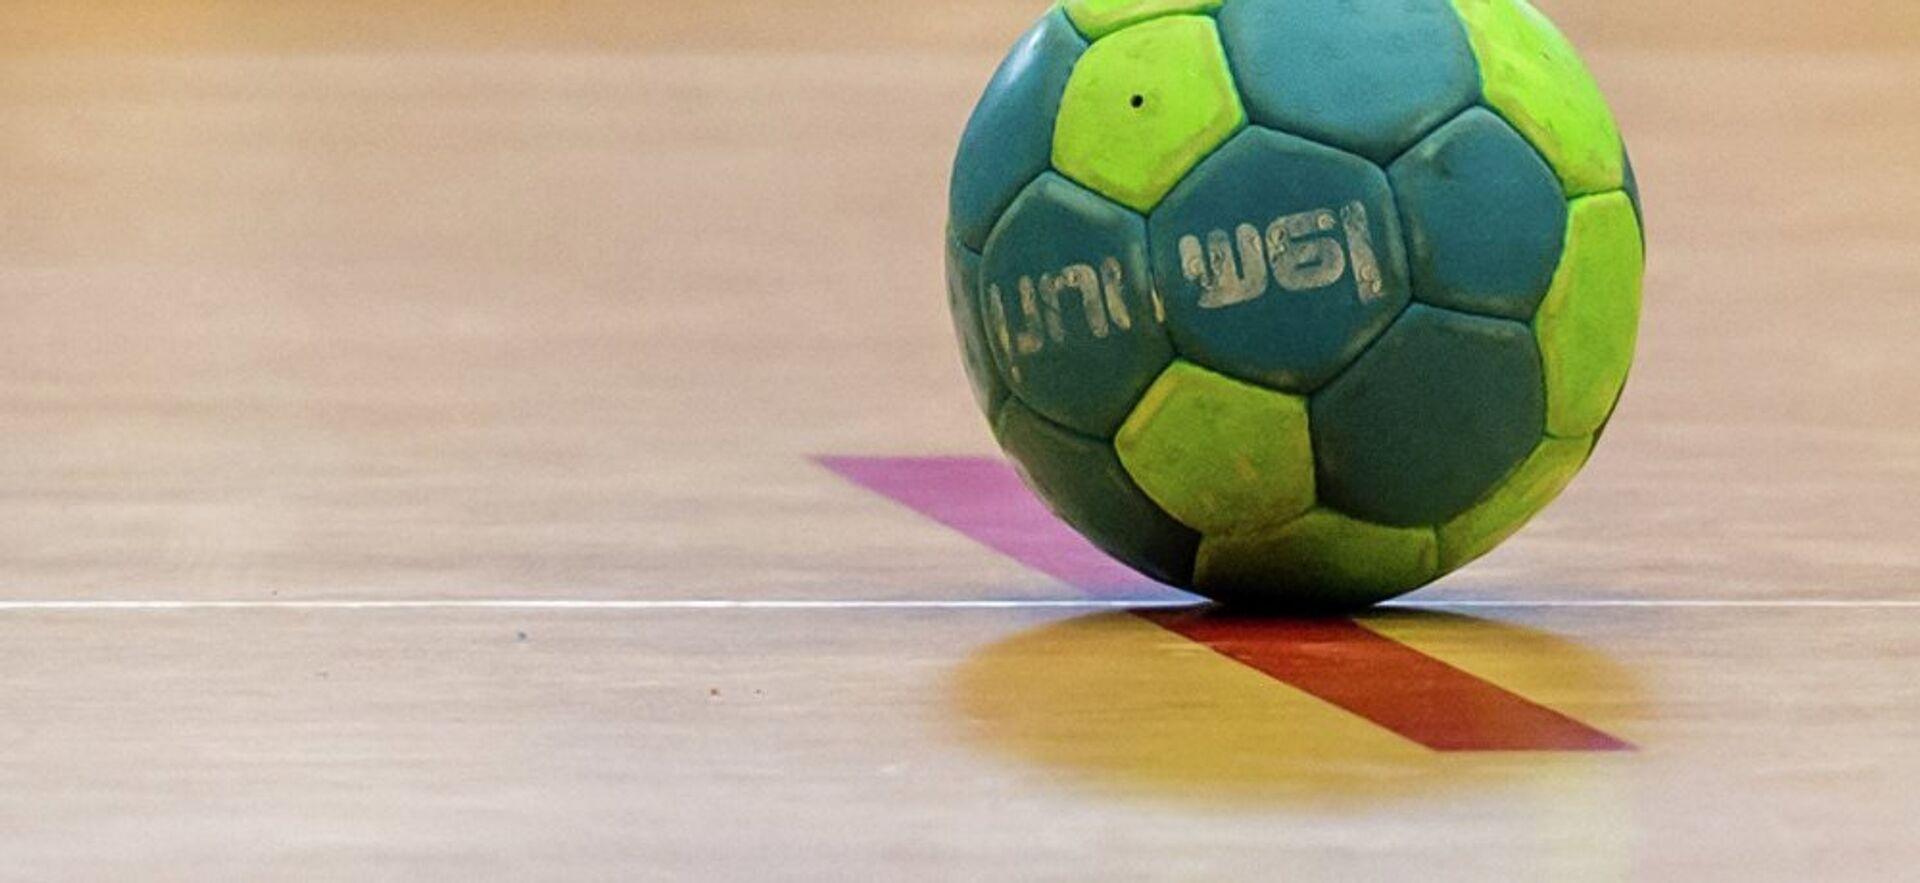 Handball - Sputnik France, 1920, 24.07.2021